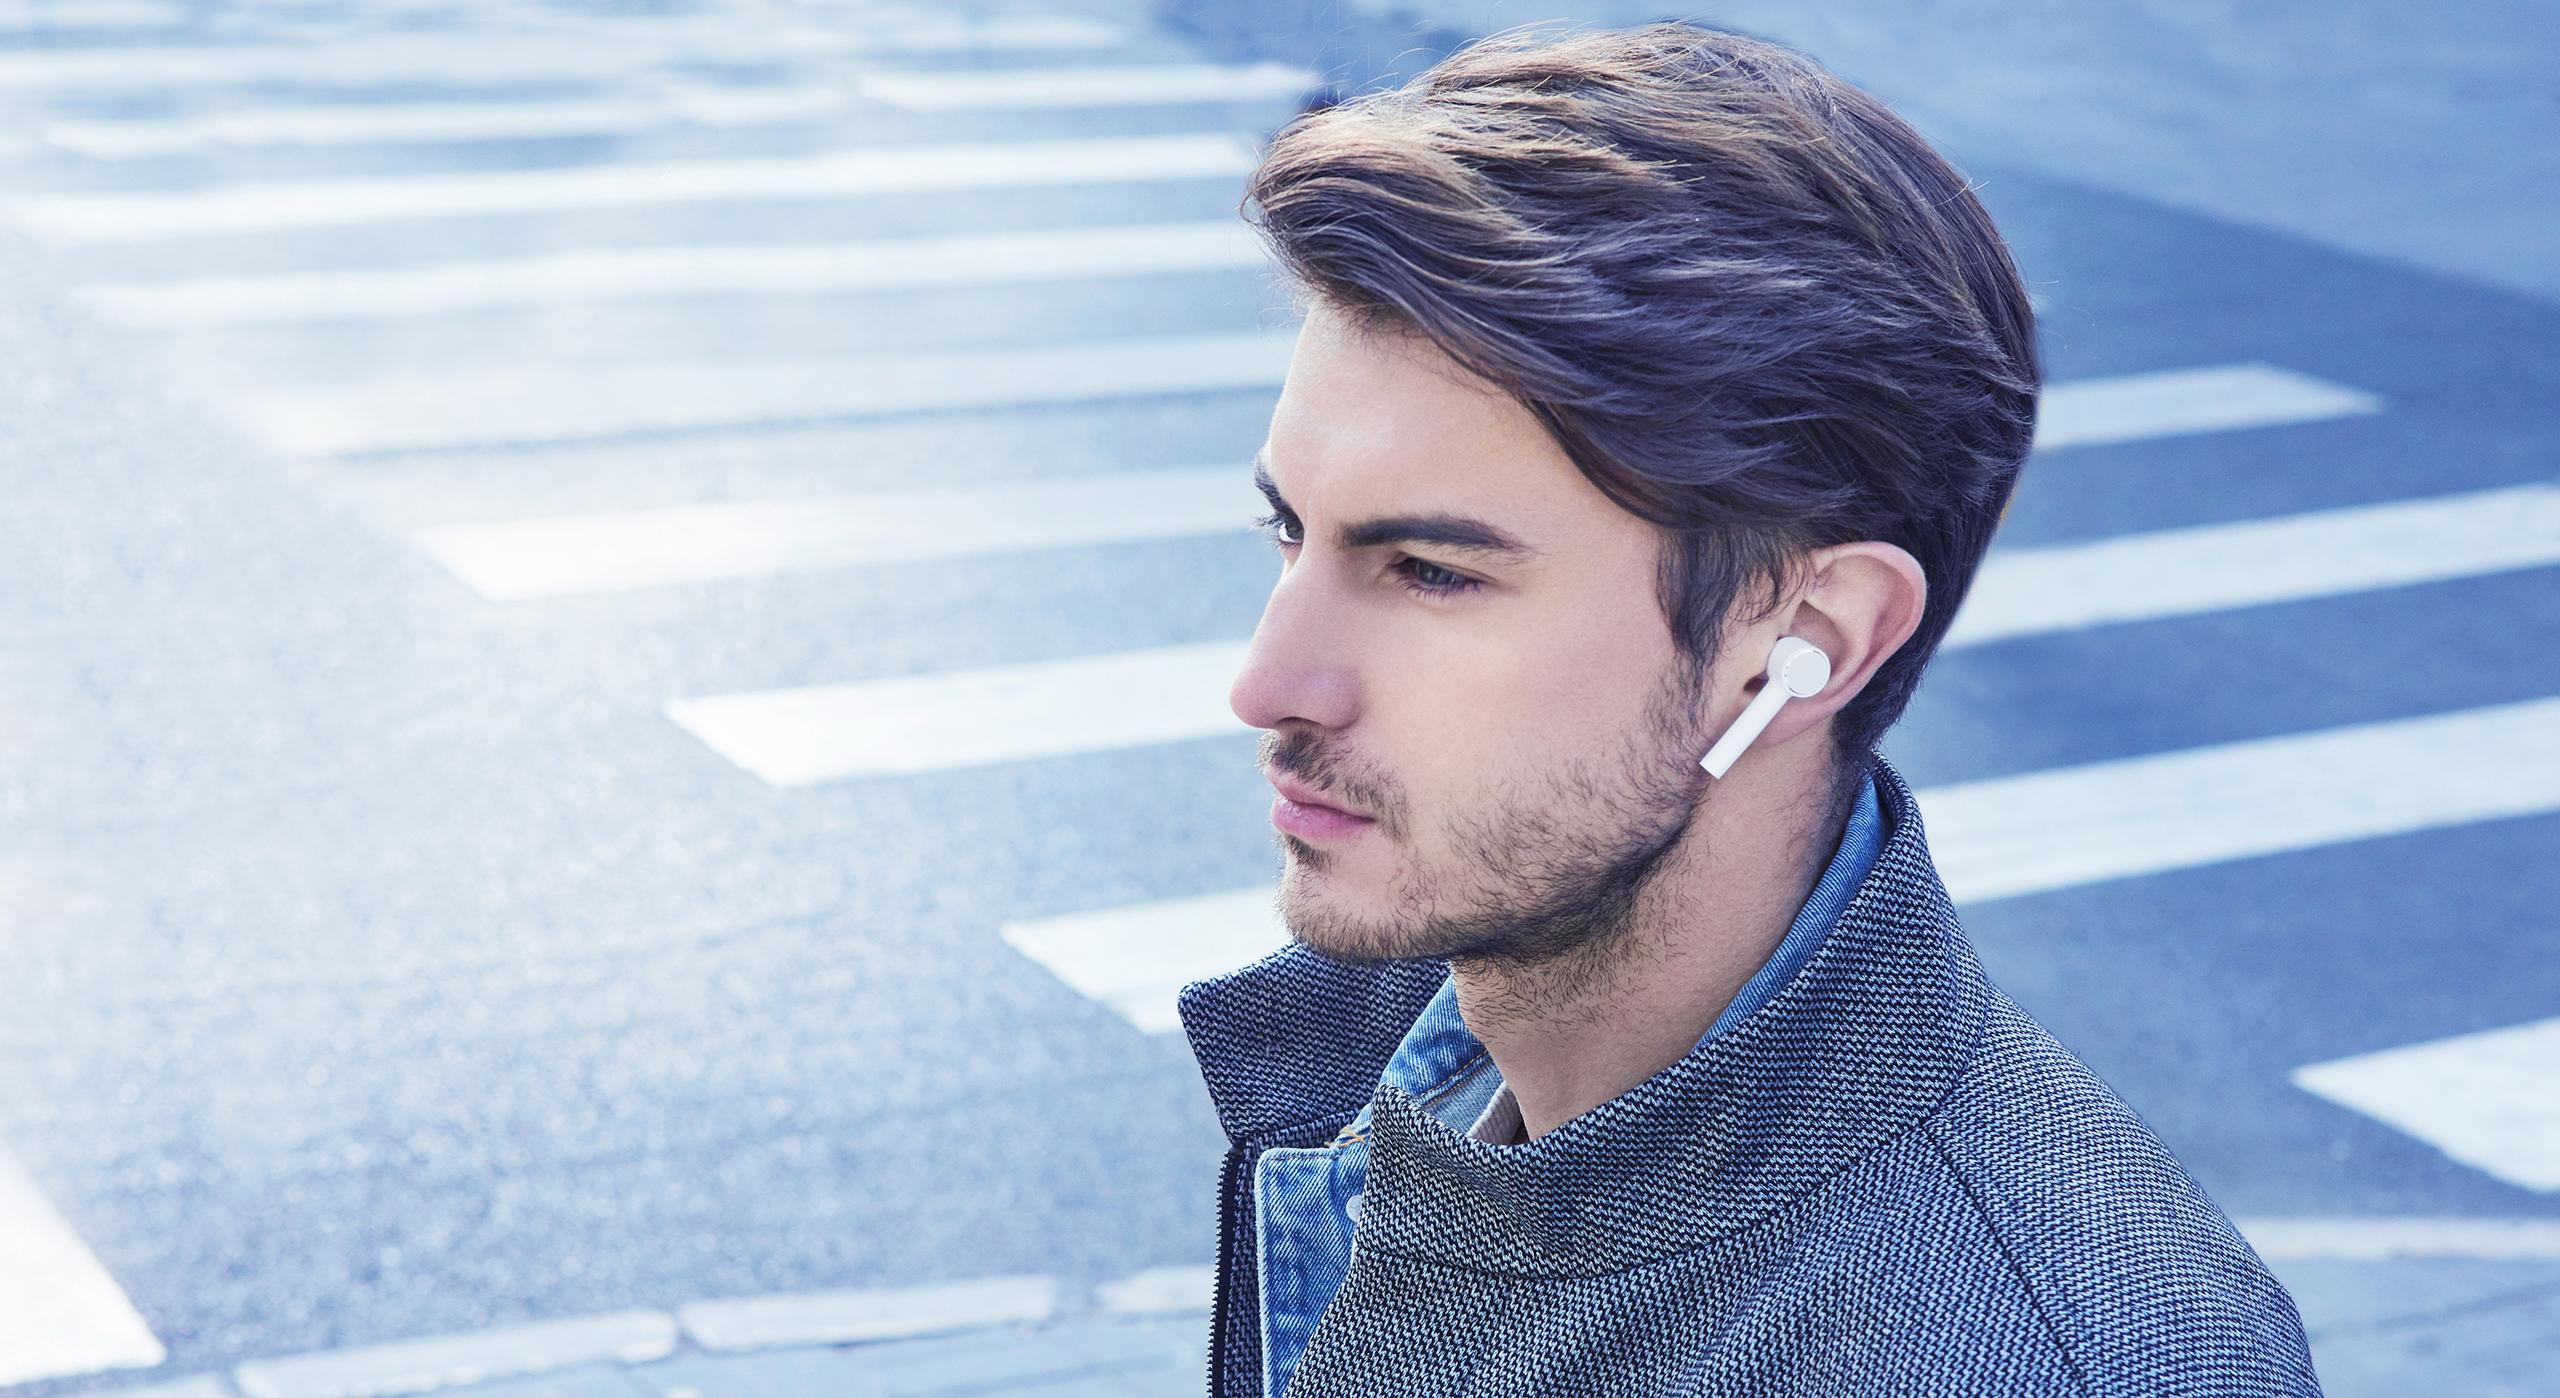 https://i01.appmifile.com/webfile/globalimg/products/pc/mi-true-wireless-earphones/section-9.jpg